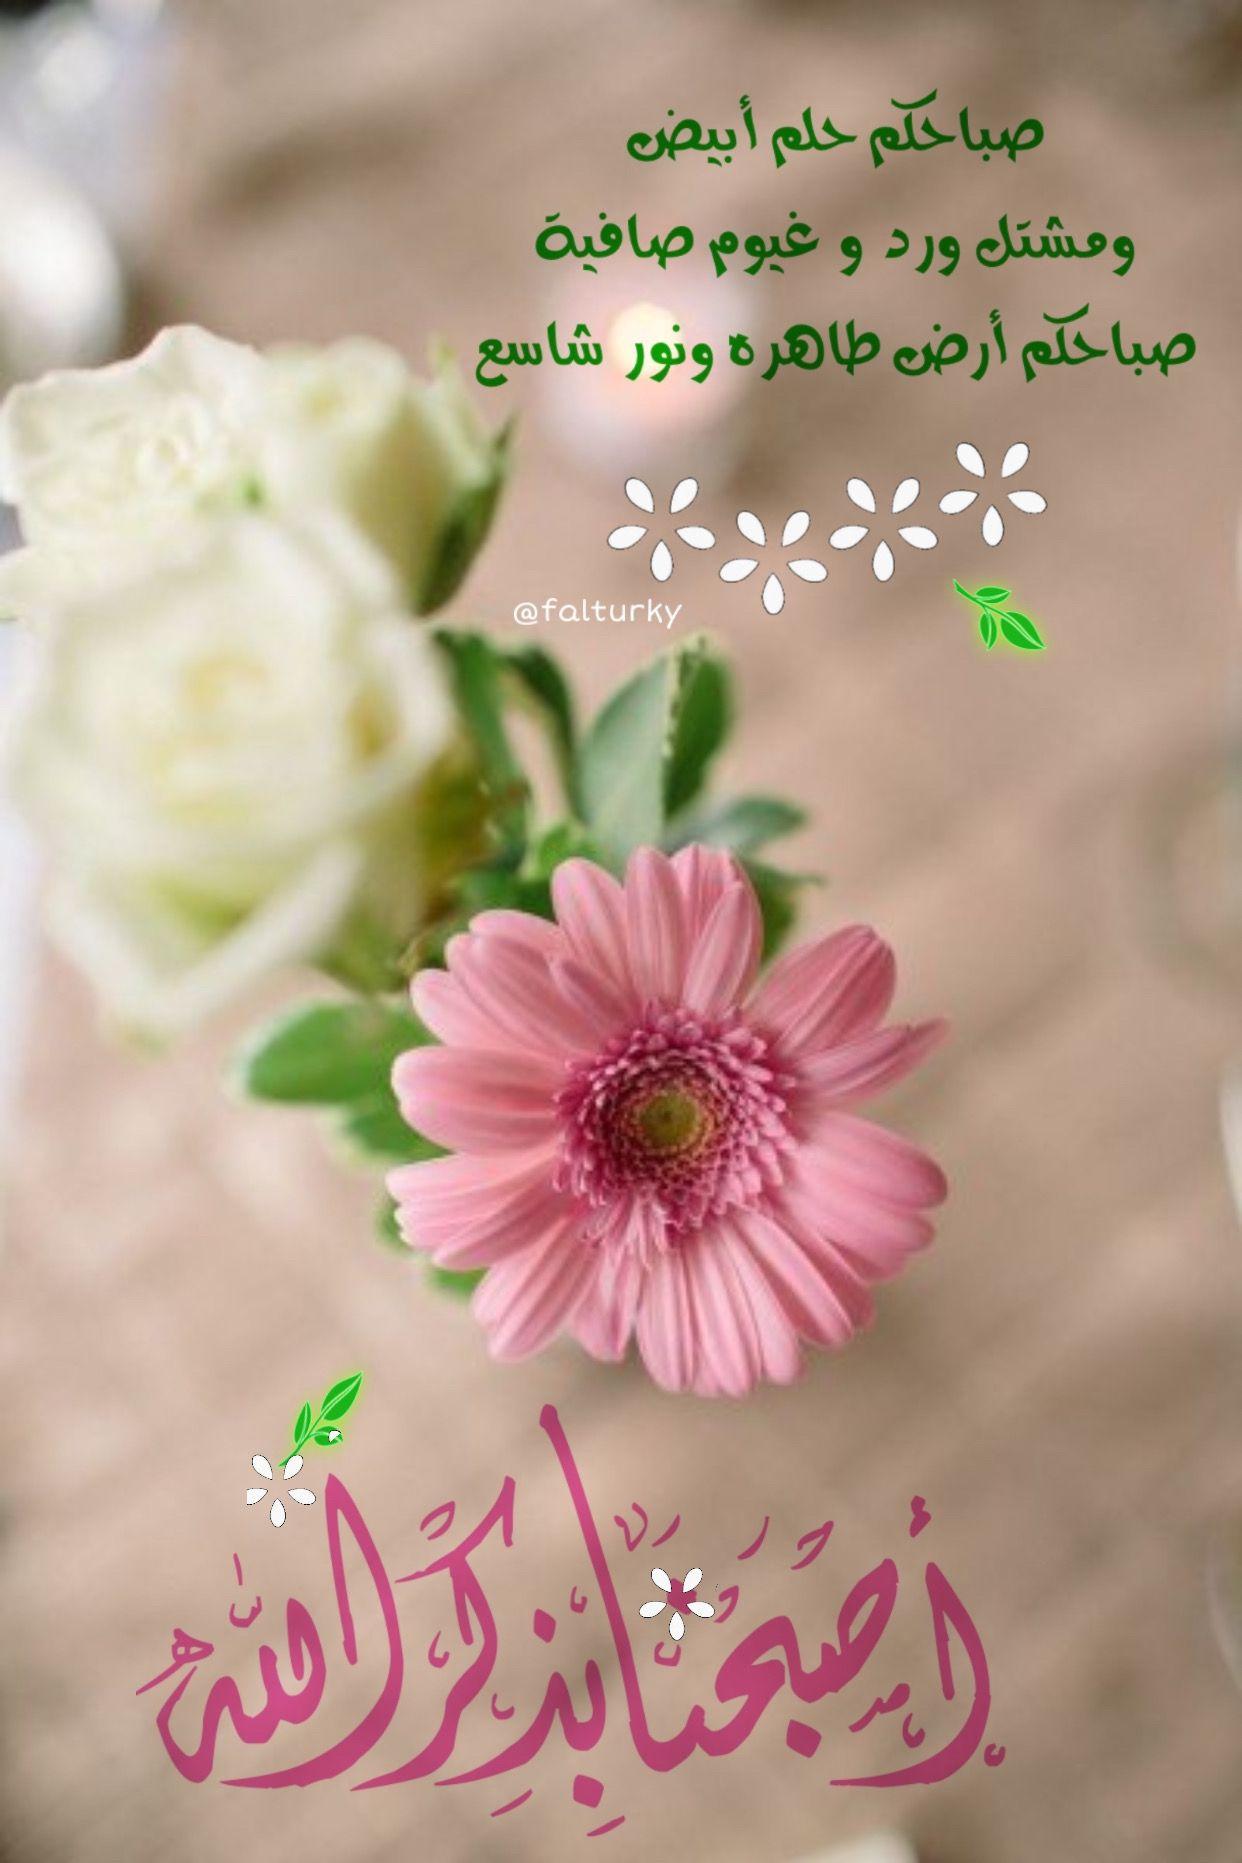 Pin By Hanan Allam On Hanan In 2021 Good Morning Gif Morning Images Morning Gif